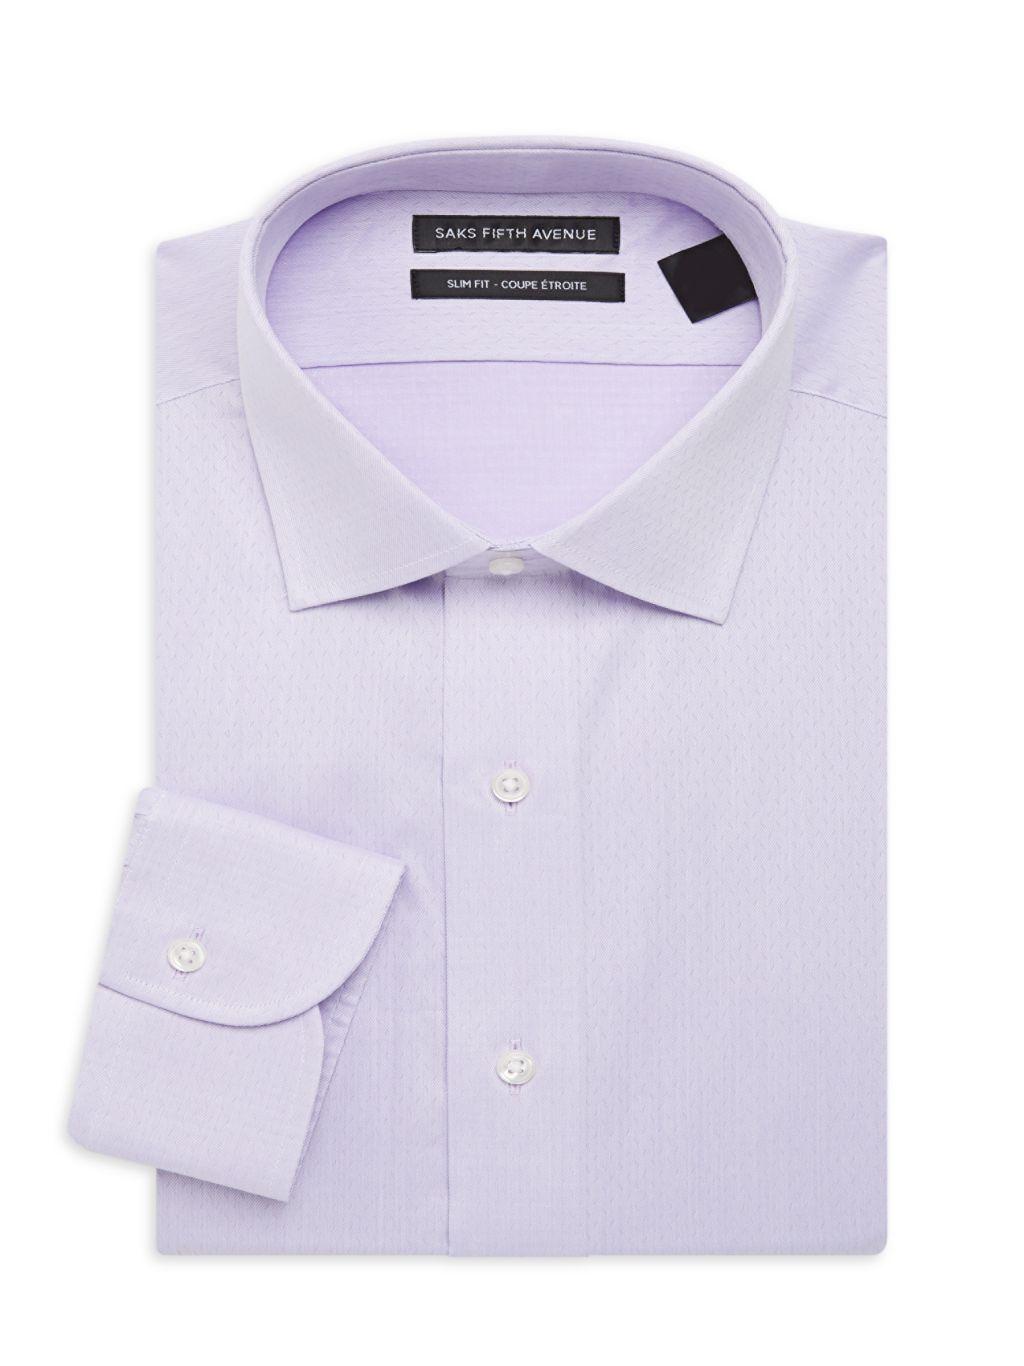 Saks Fifth Avenue Slim-Fit Dress Shirt